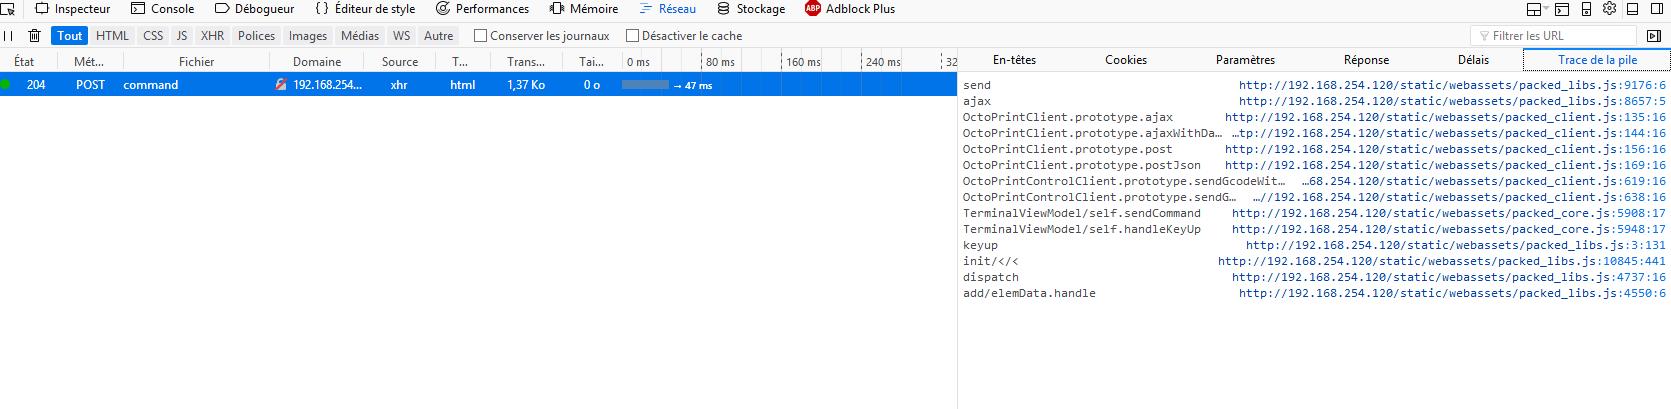 How terminal handle firmware response after sending Gcode